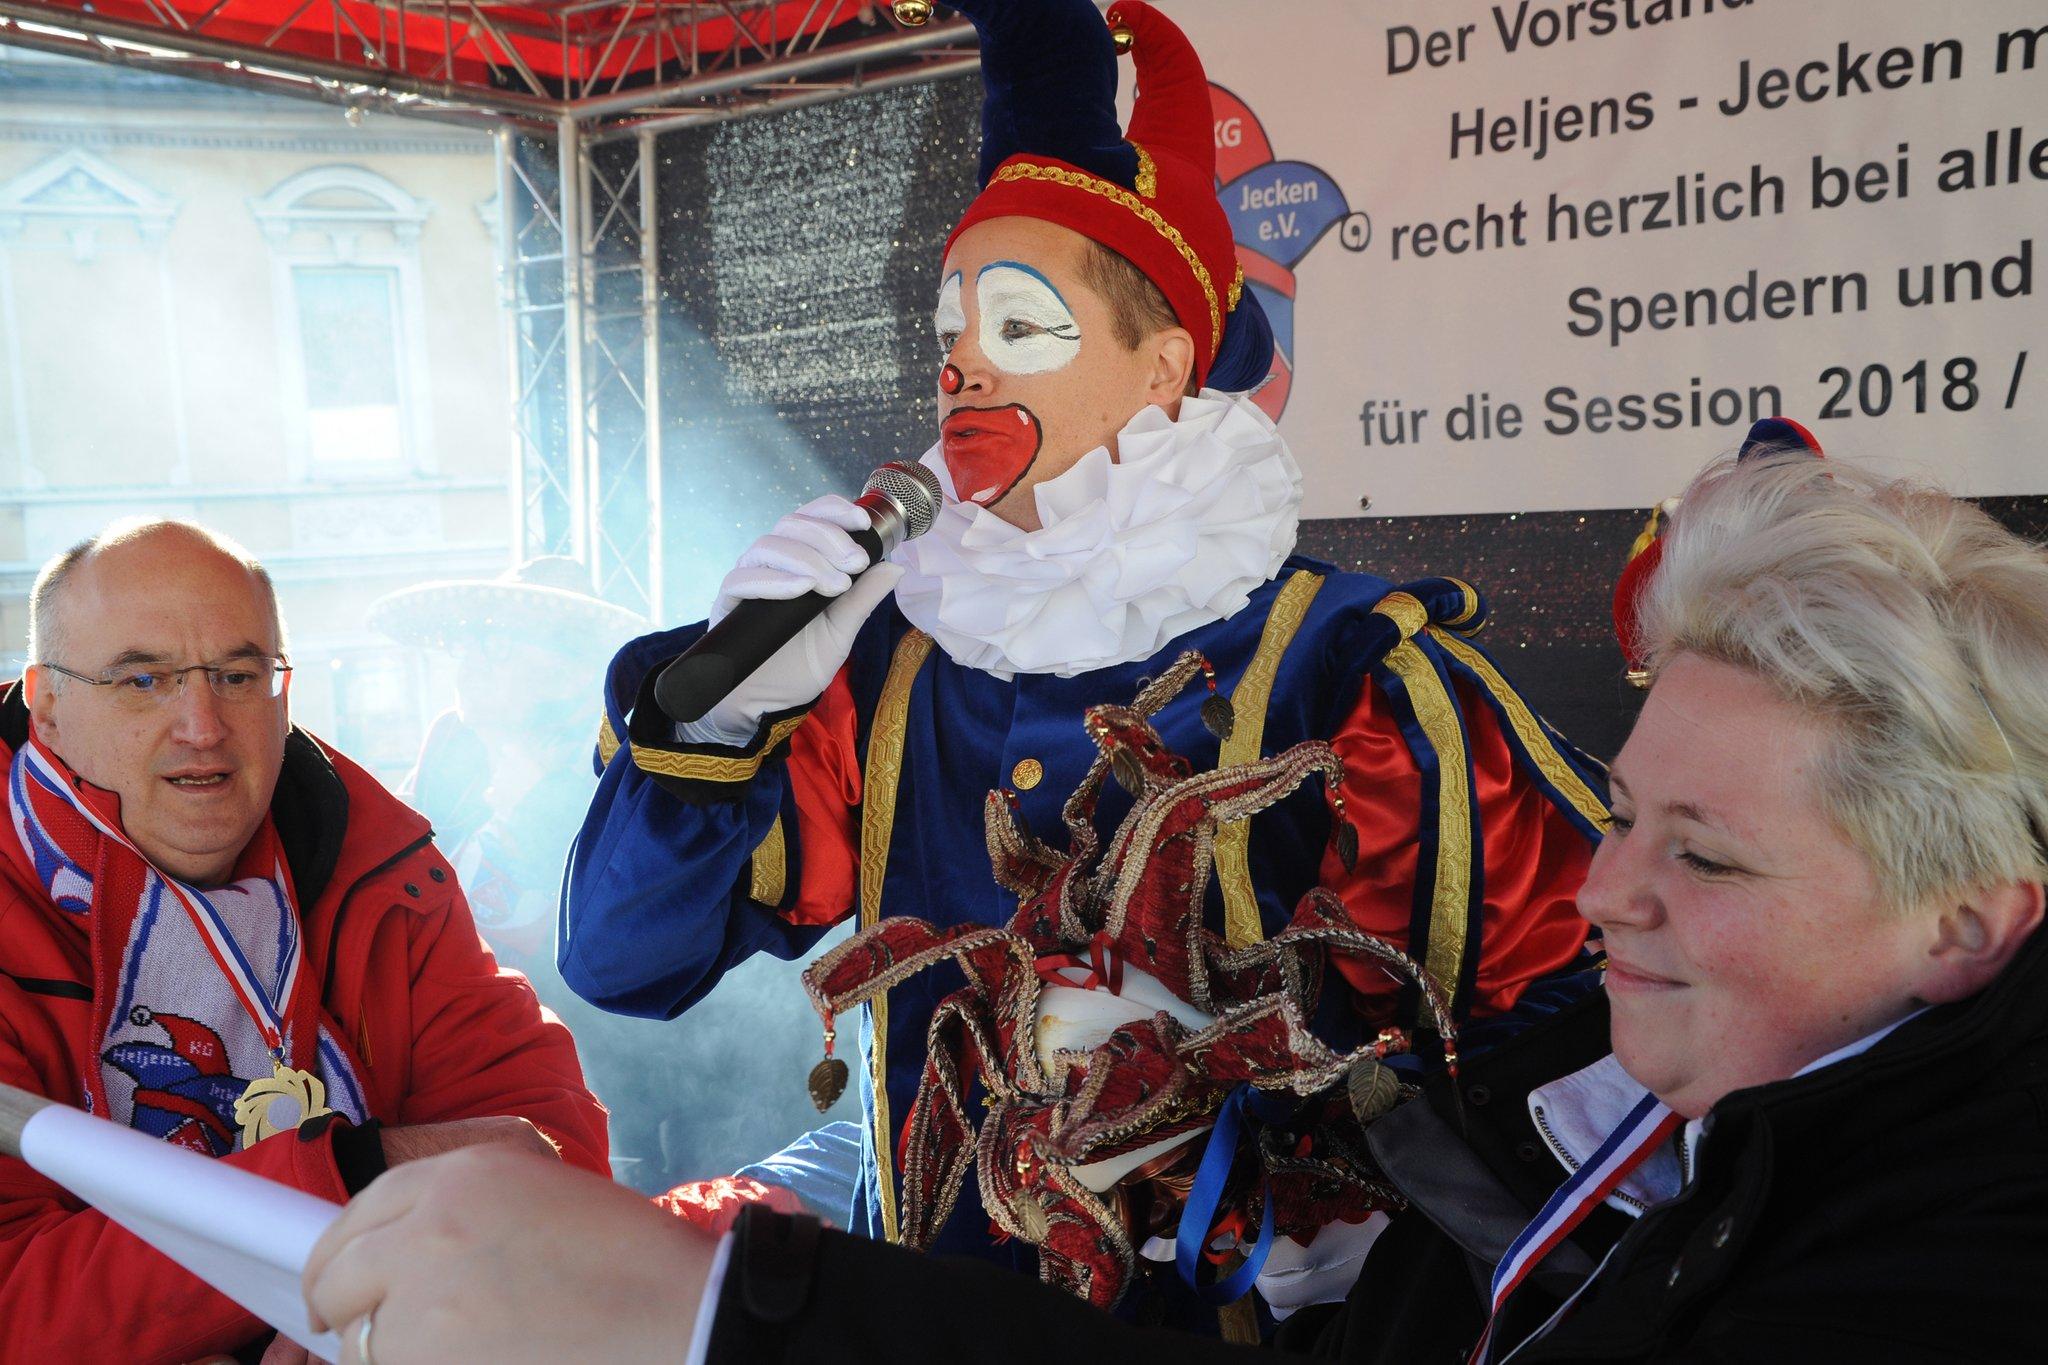 Heljens' Bürgermeister ist jeck geworden - Heiligenhaus - Lokalkompass.de